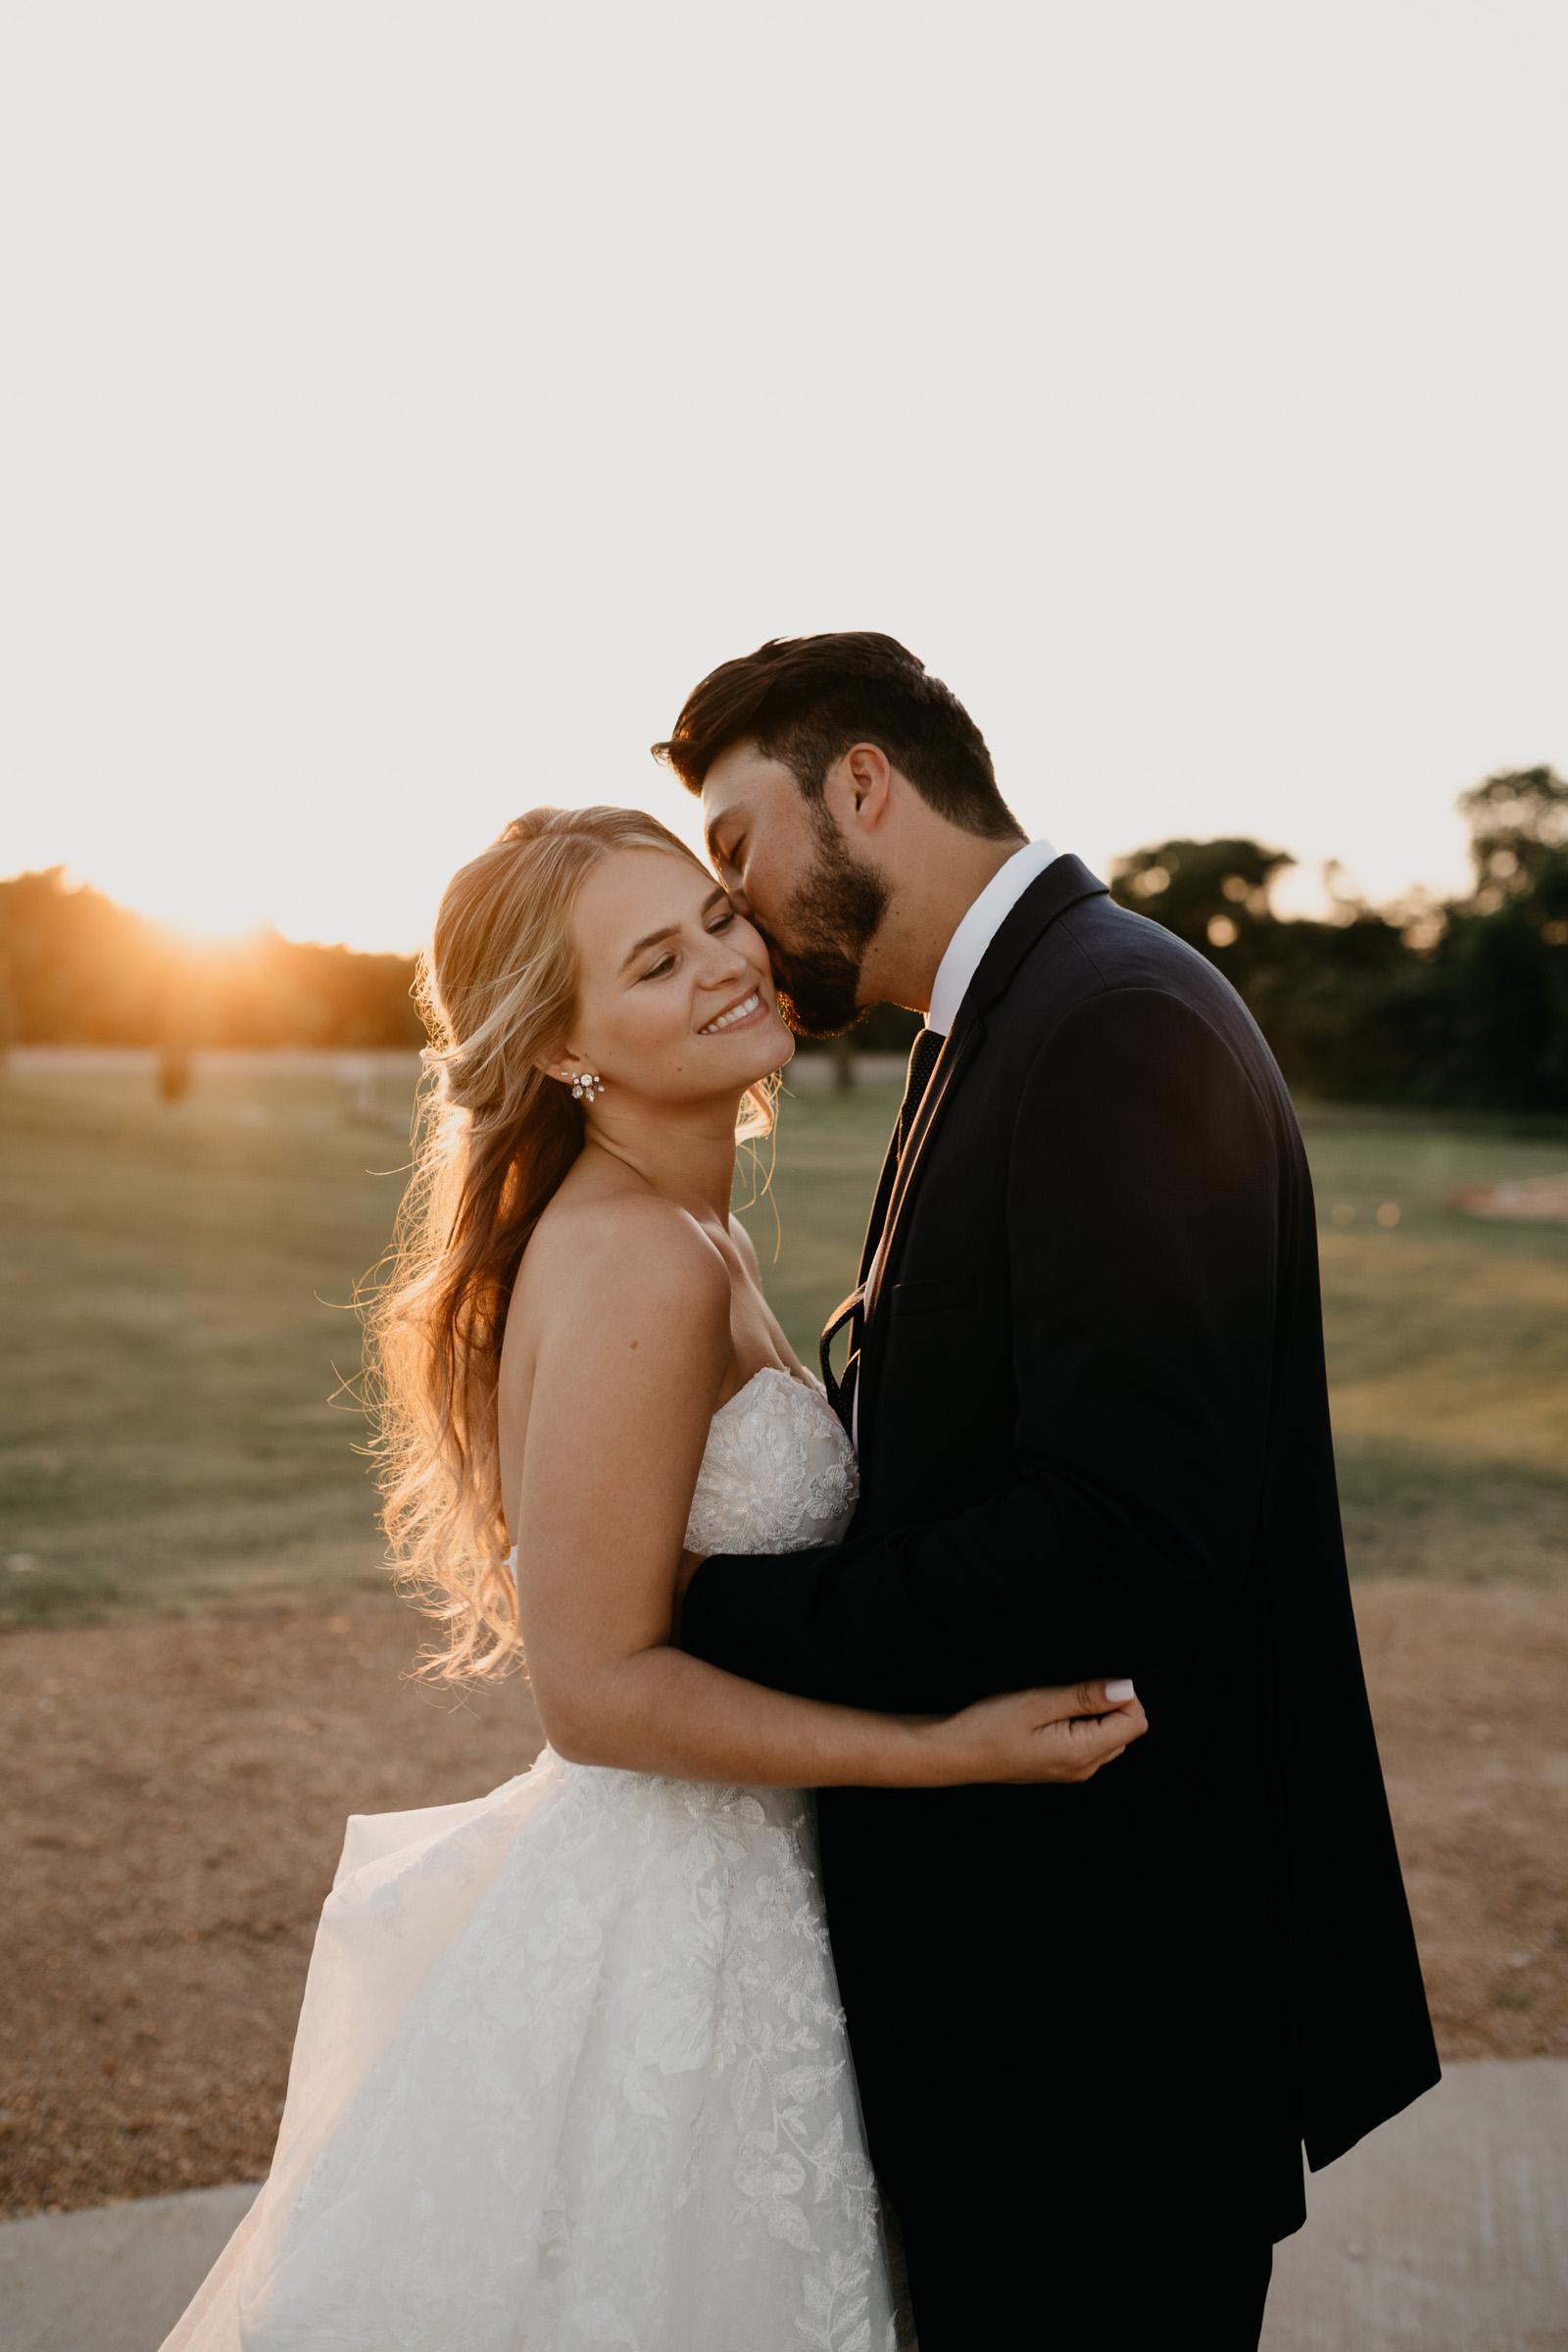 golden hour bride and groom wedding portrait in Dallas Texas